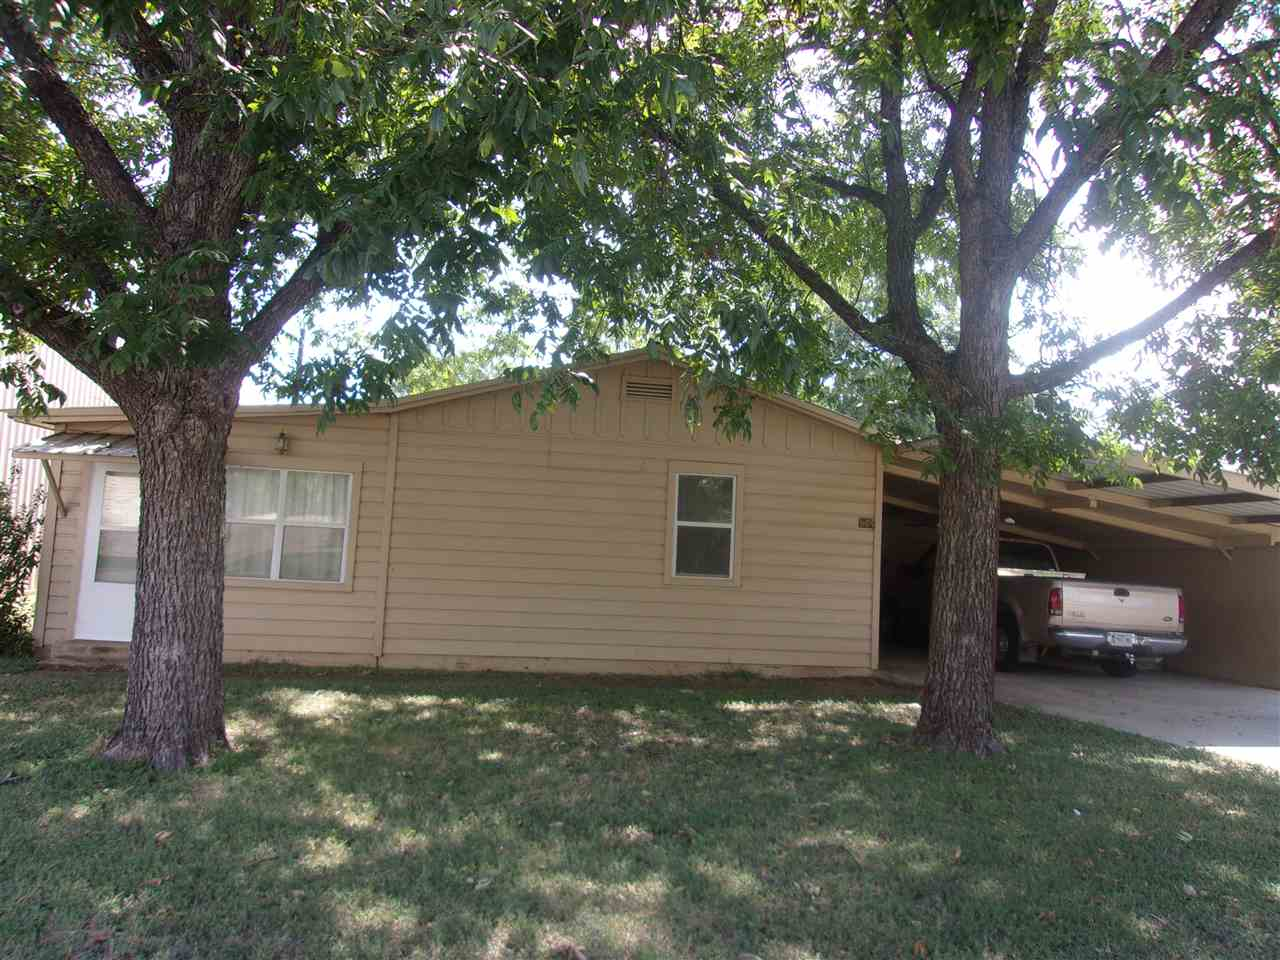 Llano, TX - South